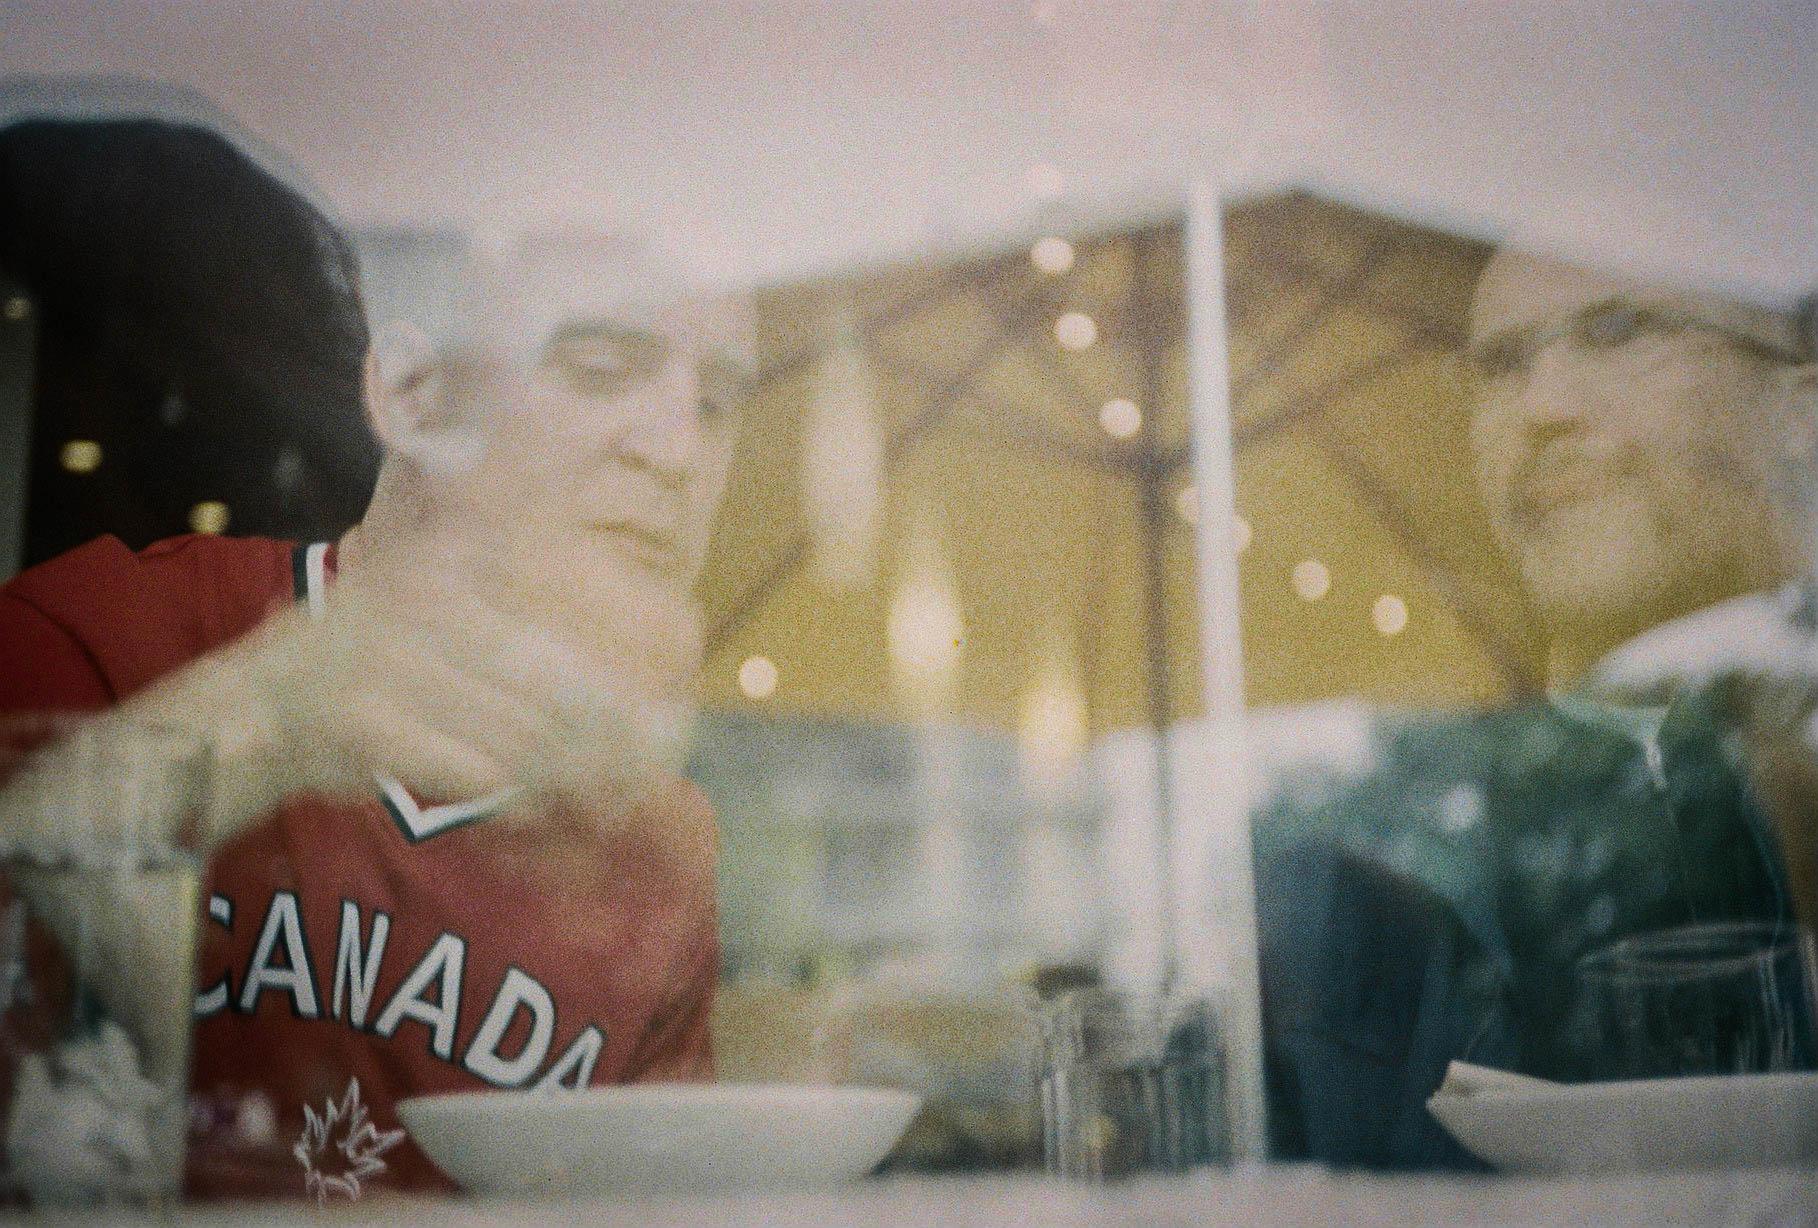 Men eating lunch in window Vancouver Rollei FX35 Fujicolor 400 film 7.16